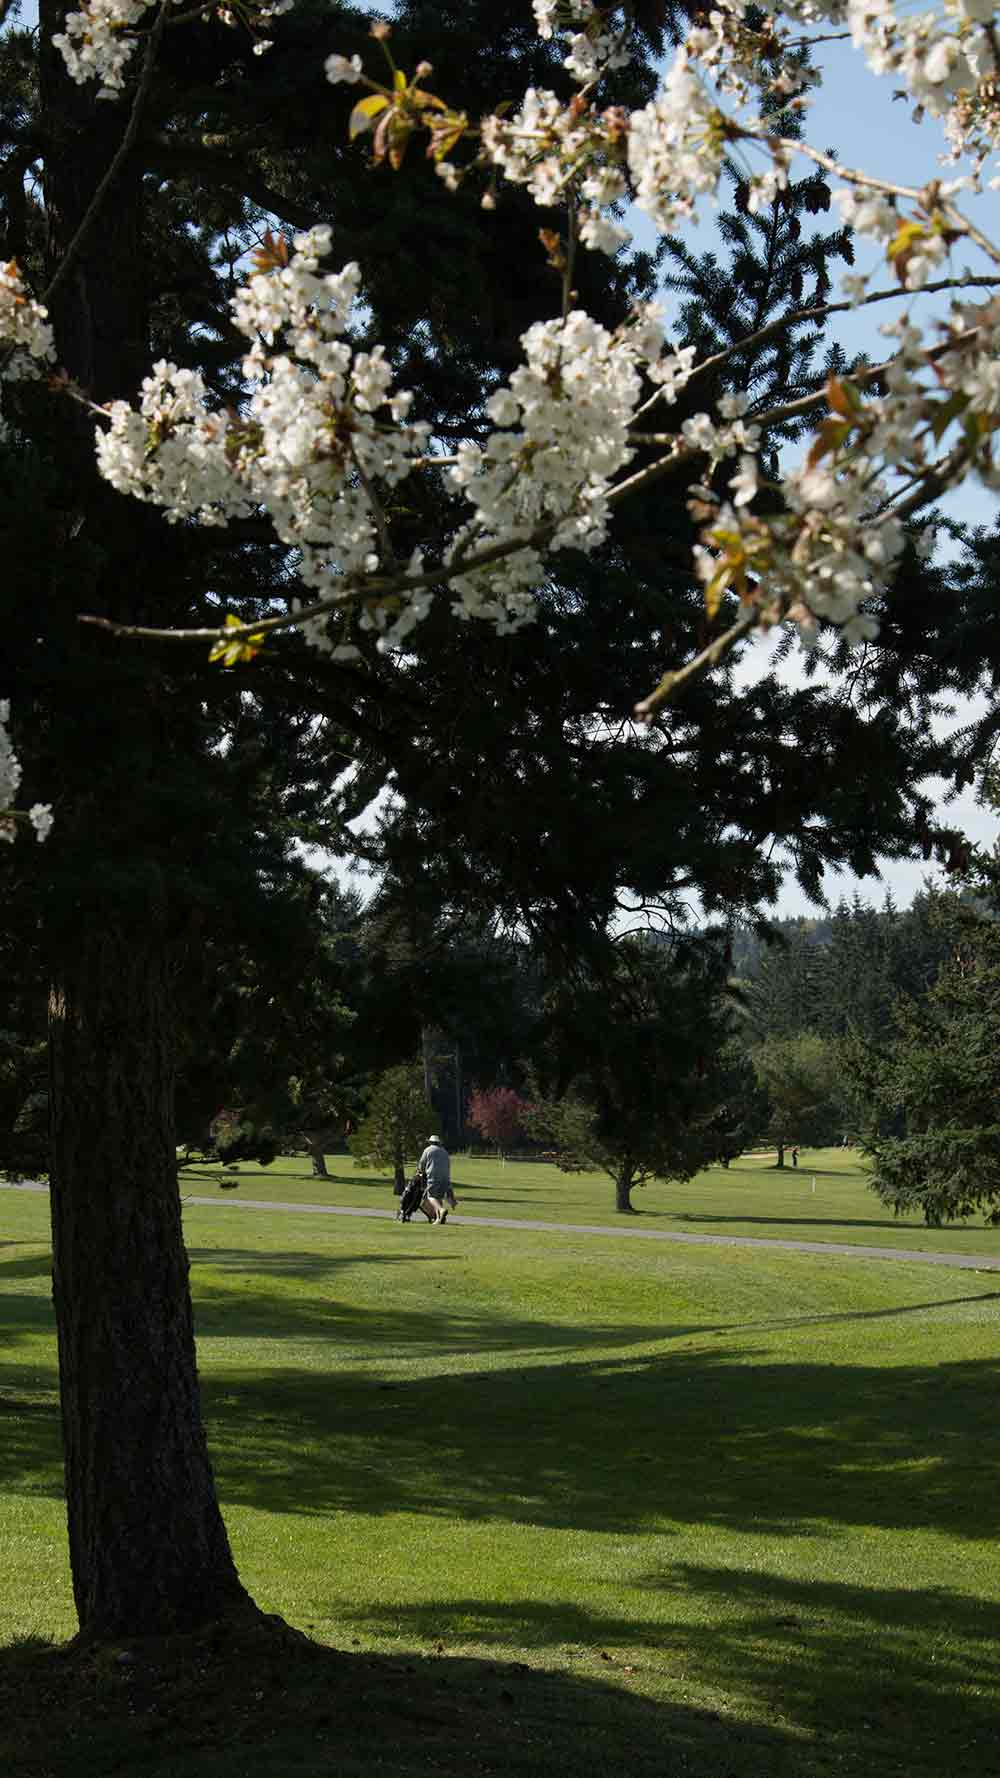 Camaloch Golf Course on Camano Island